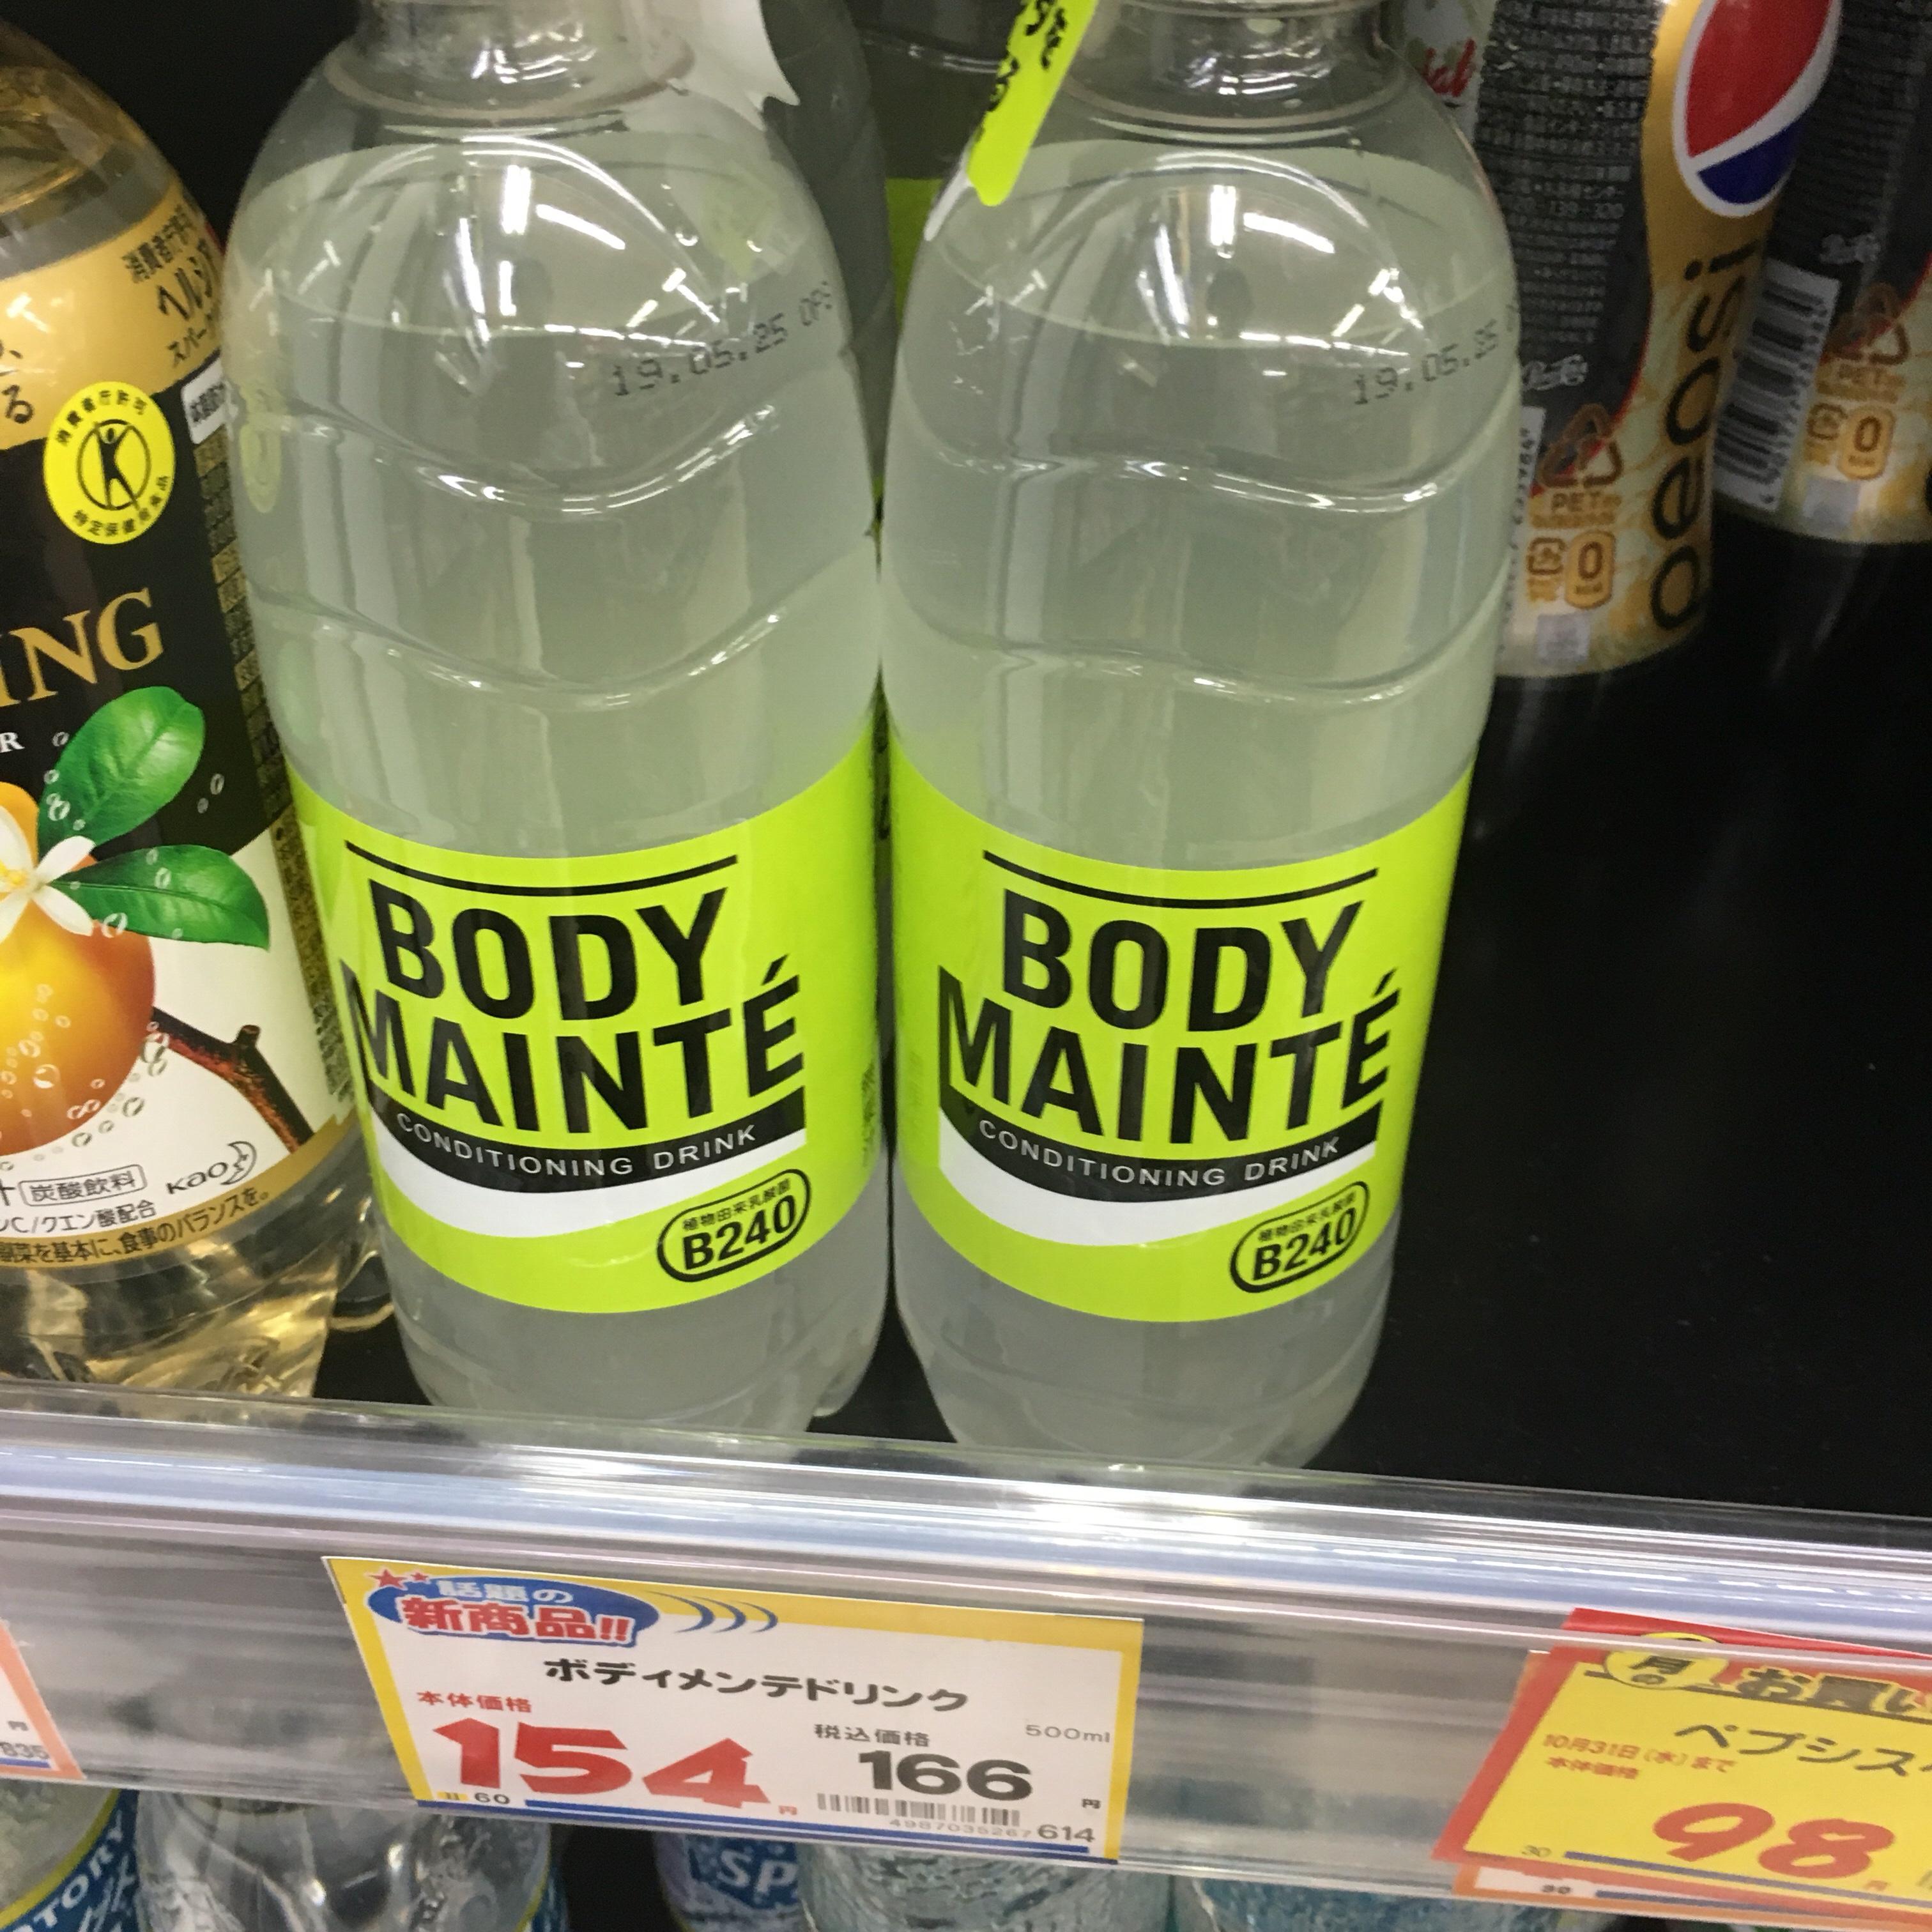 BODY MAINTE